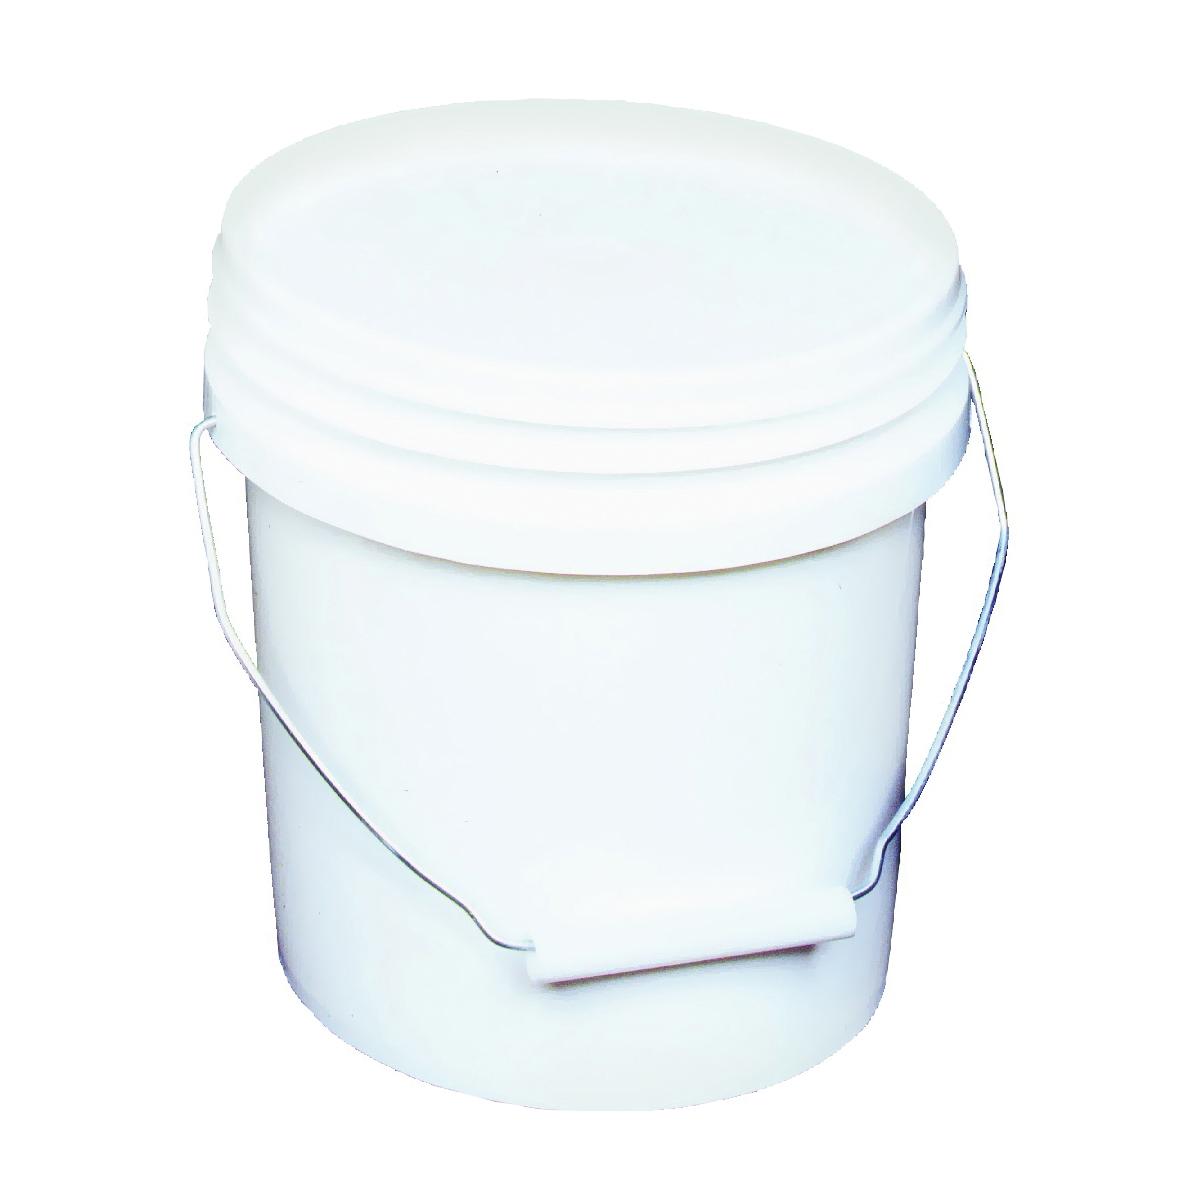 Picture of ENCORE Plastics 10128 Paint Pail, 1 gal Capacity, HDPE, White